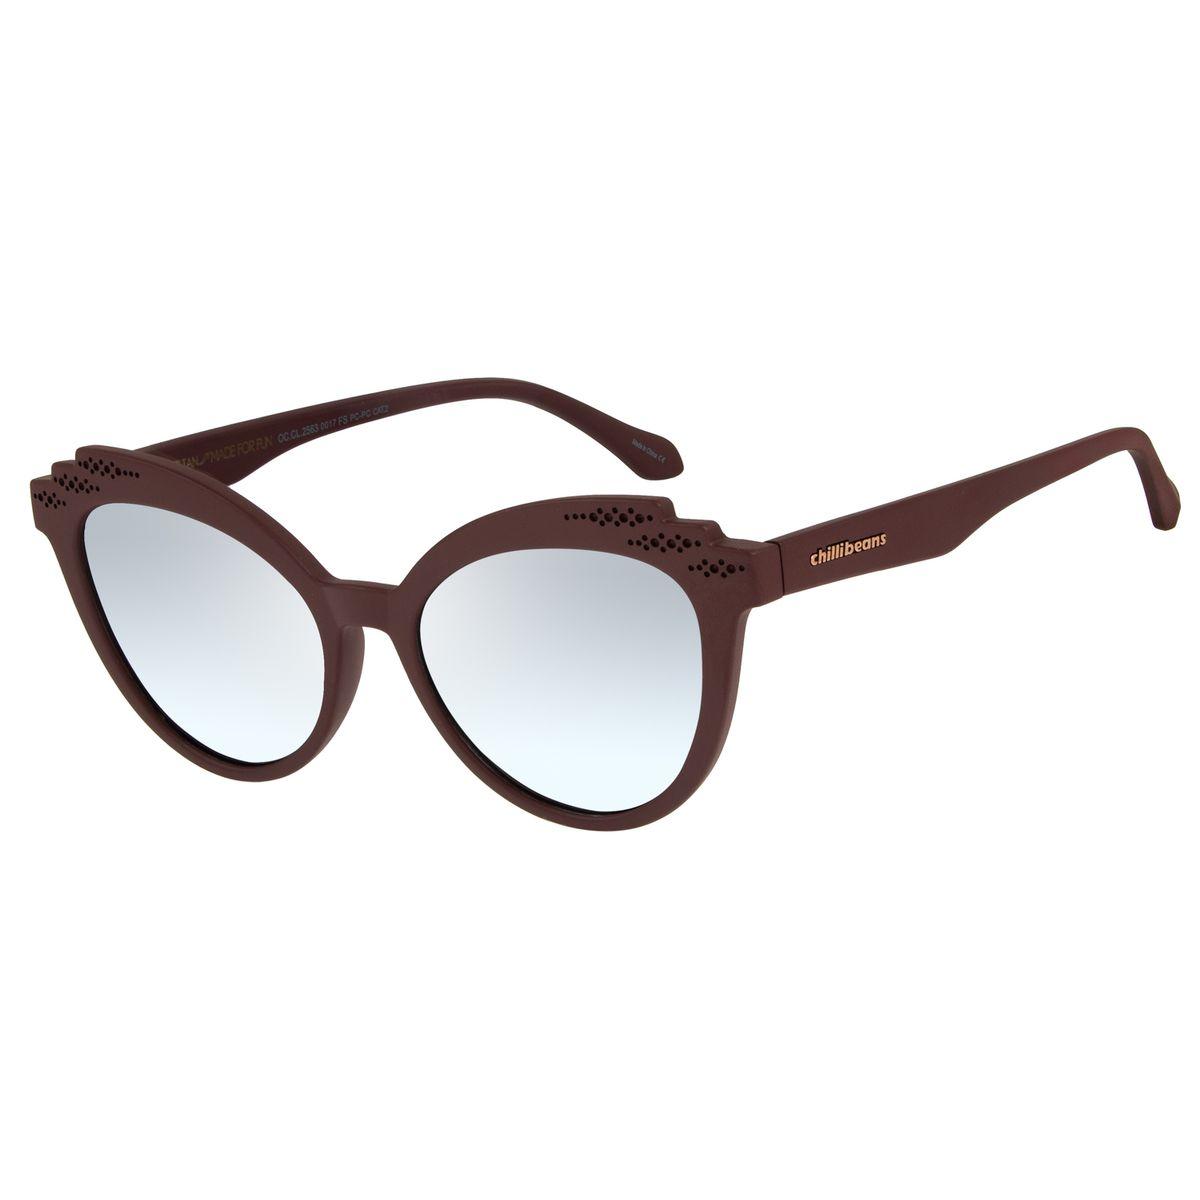 d61a5229b Óculos de Sol Feminino Chilli Beans Vinho 2563 - OC.CL.2563.0017 M. REF:  OC.CL.2563.0017. OC.